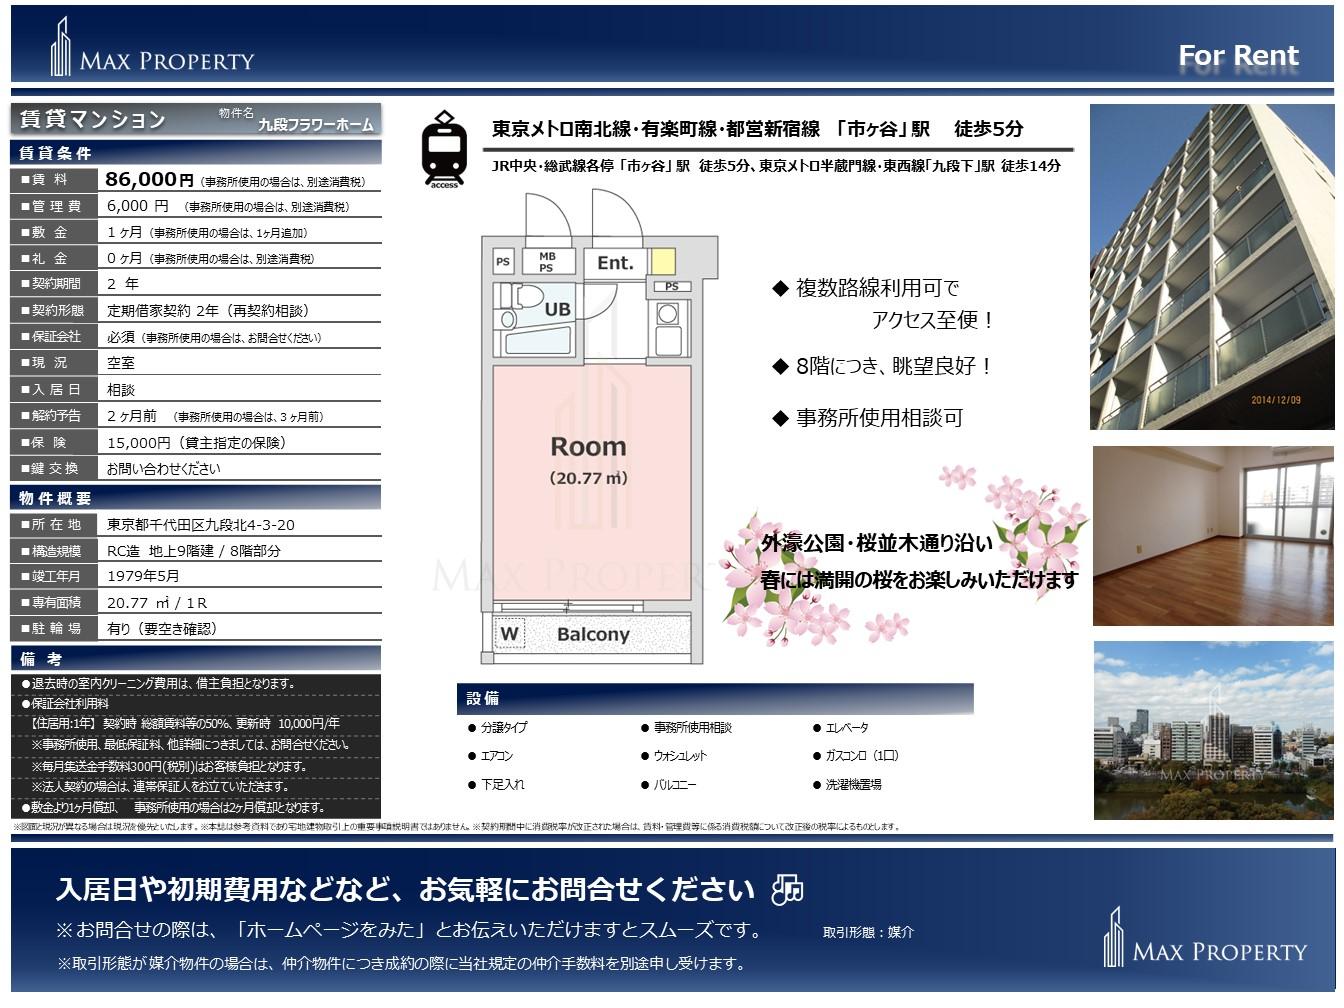 HP_九段フラワーホーム807_20191203